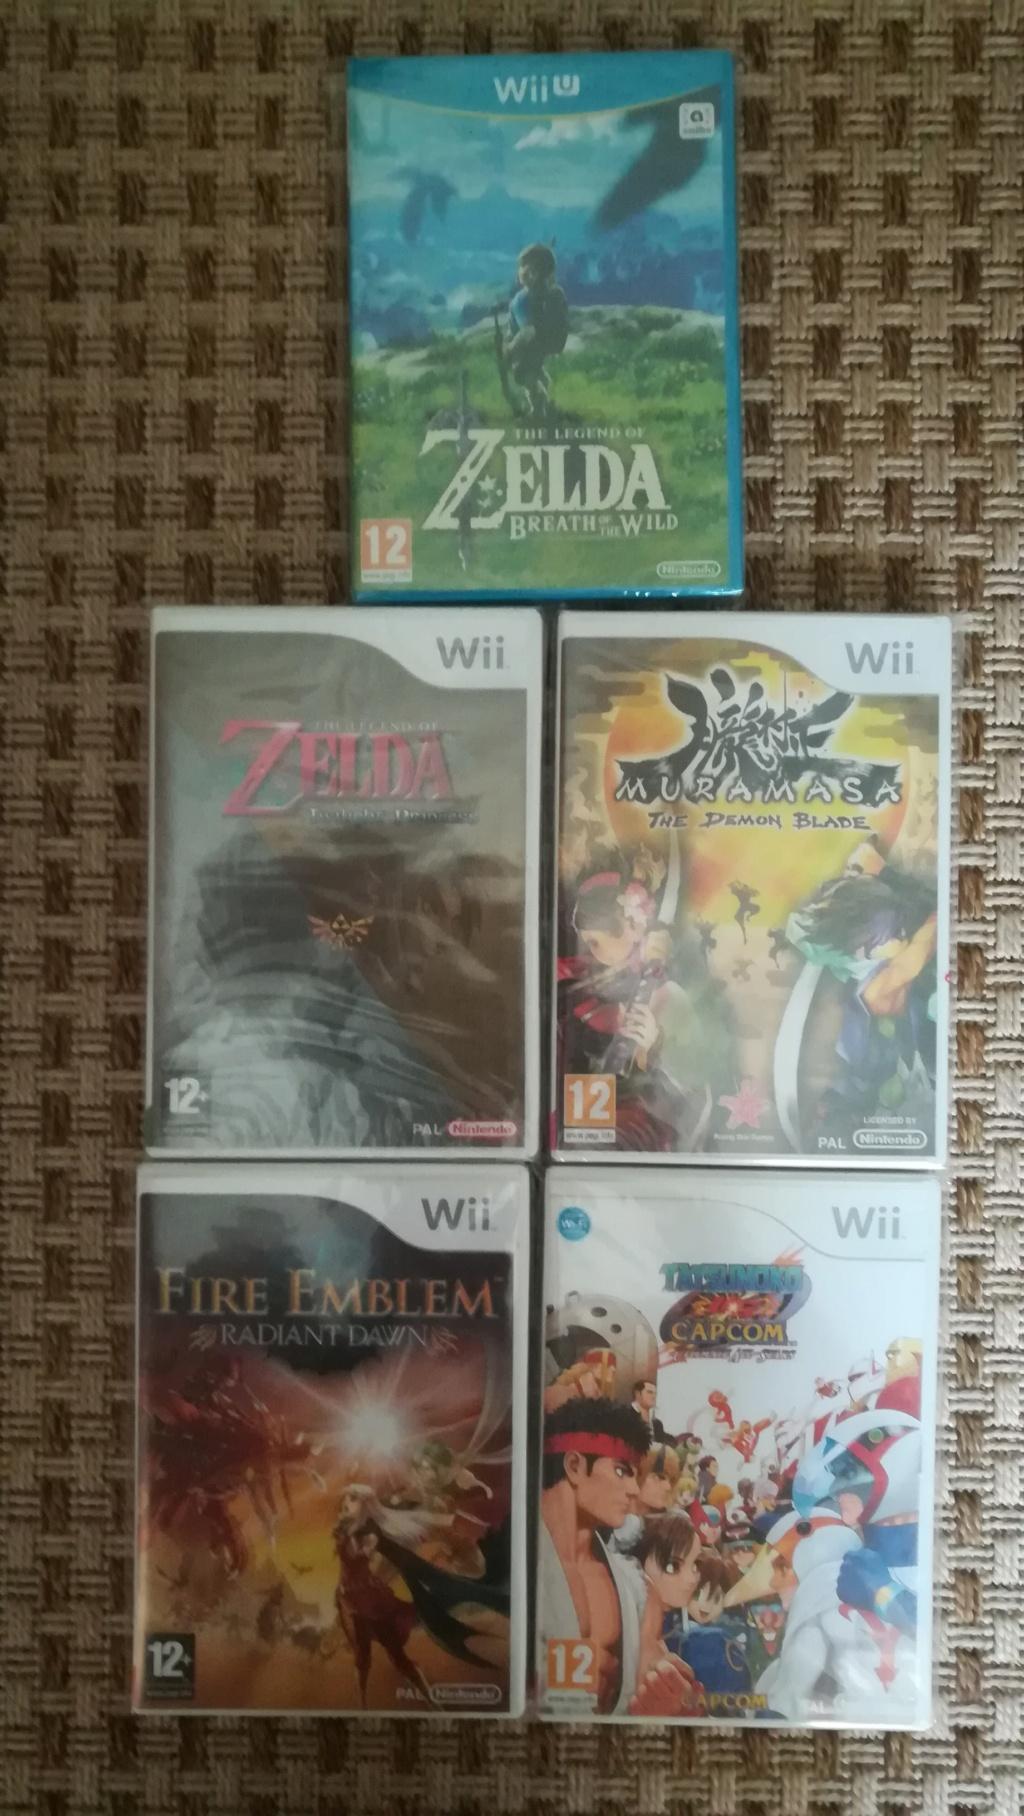 [Vendu] Collection Game cube/Wii/WiiU Img_2106